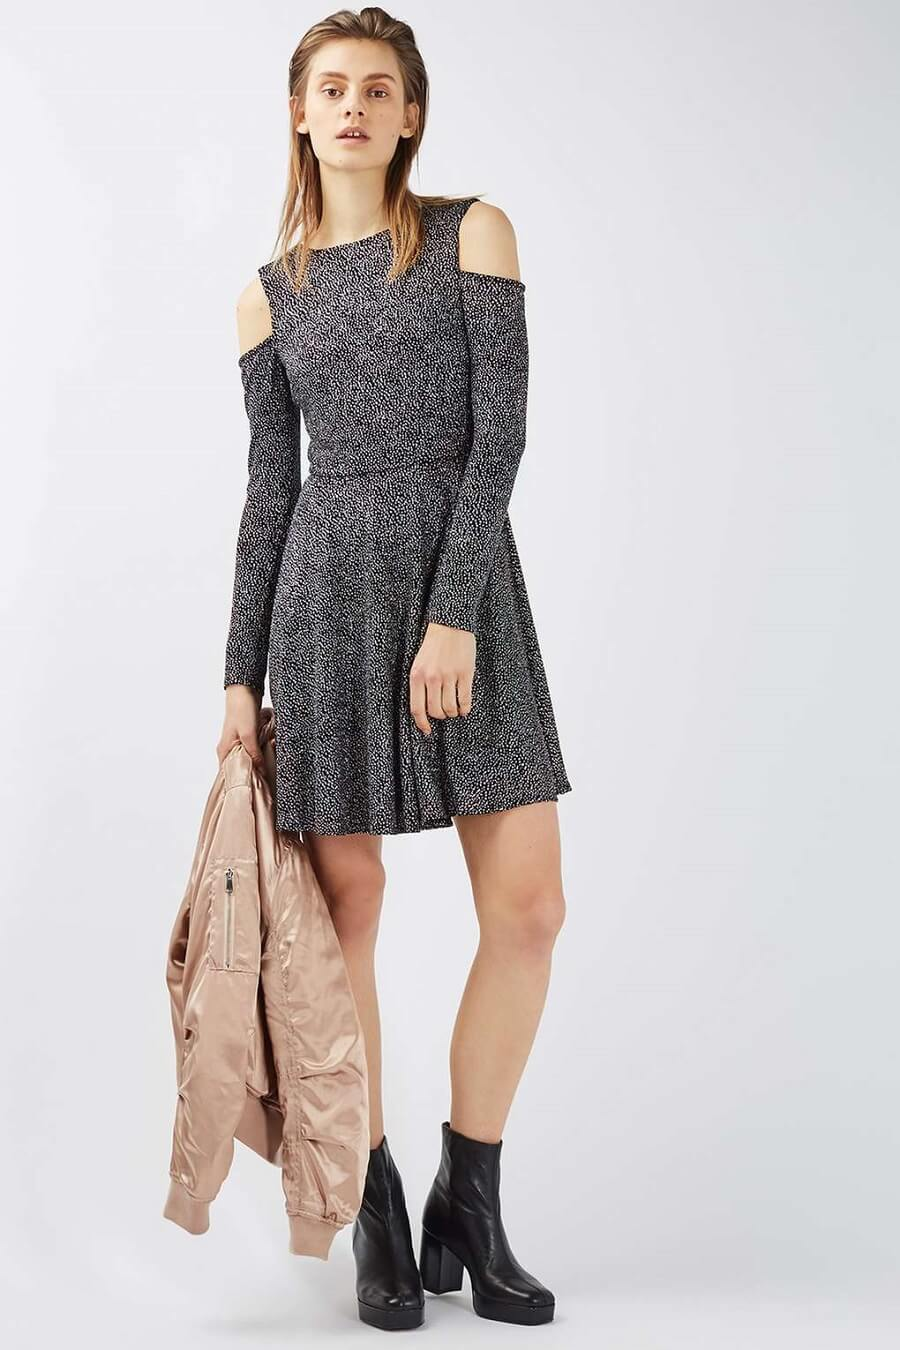 young woman wearing a short glittery dress